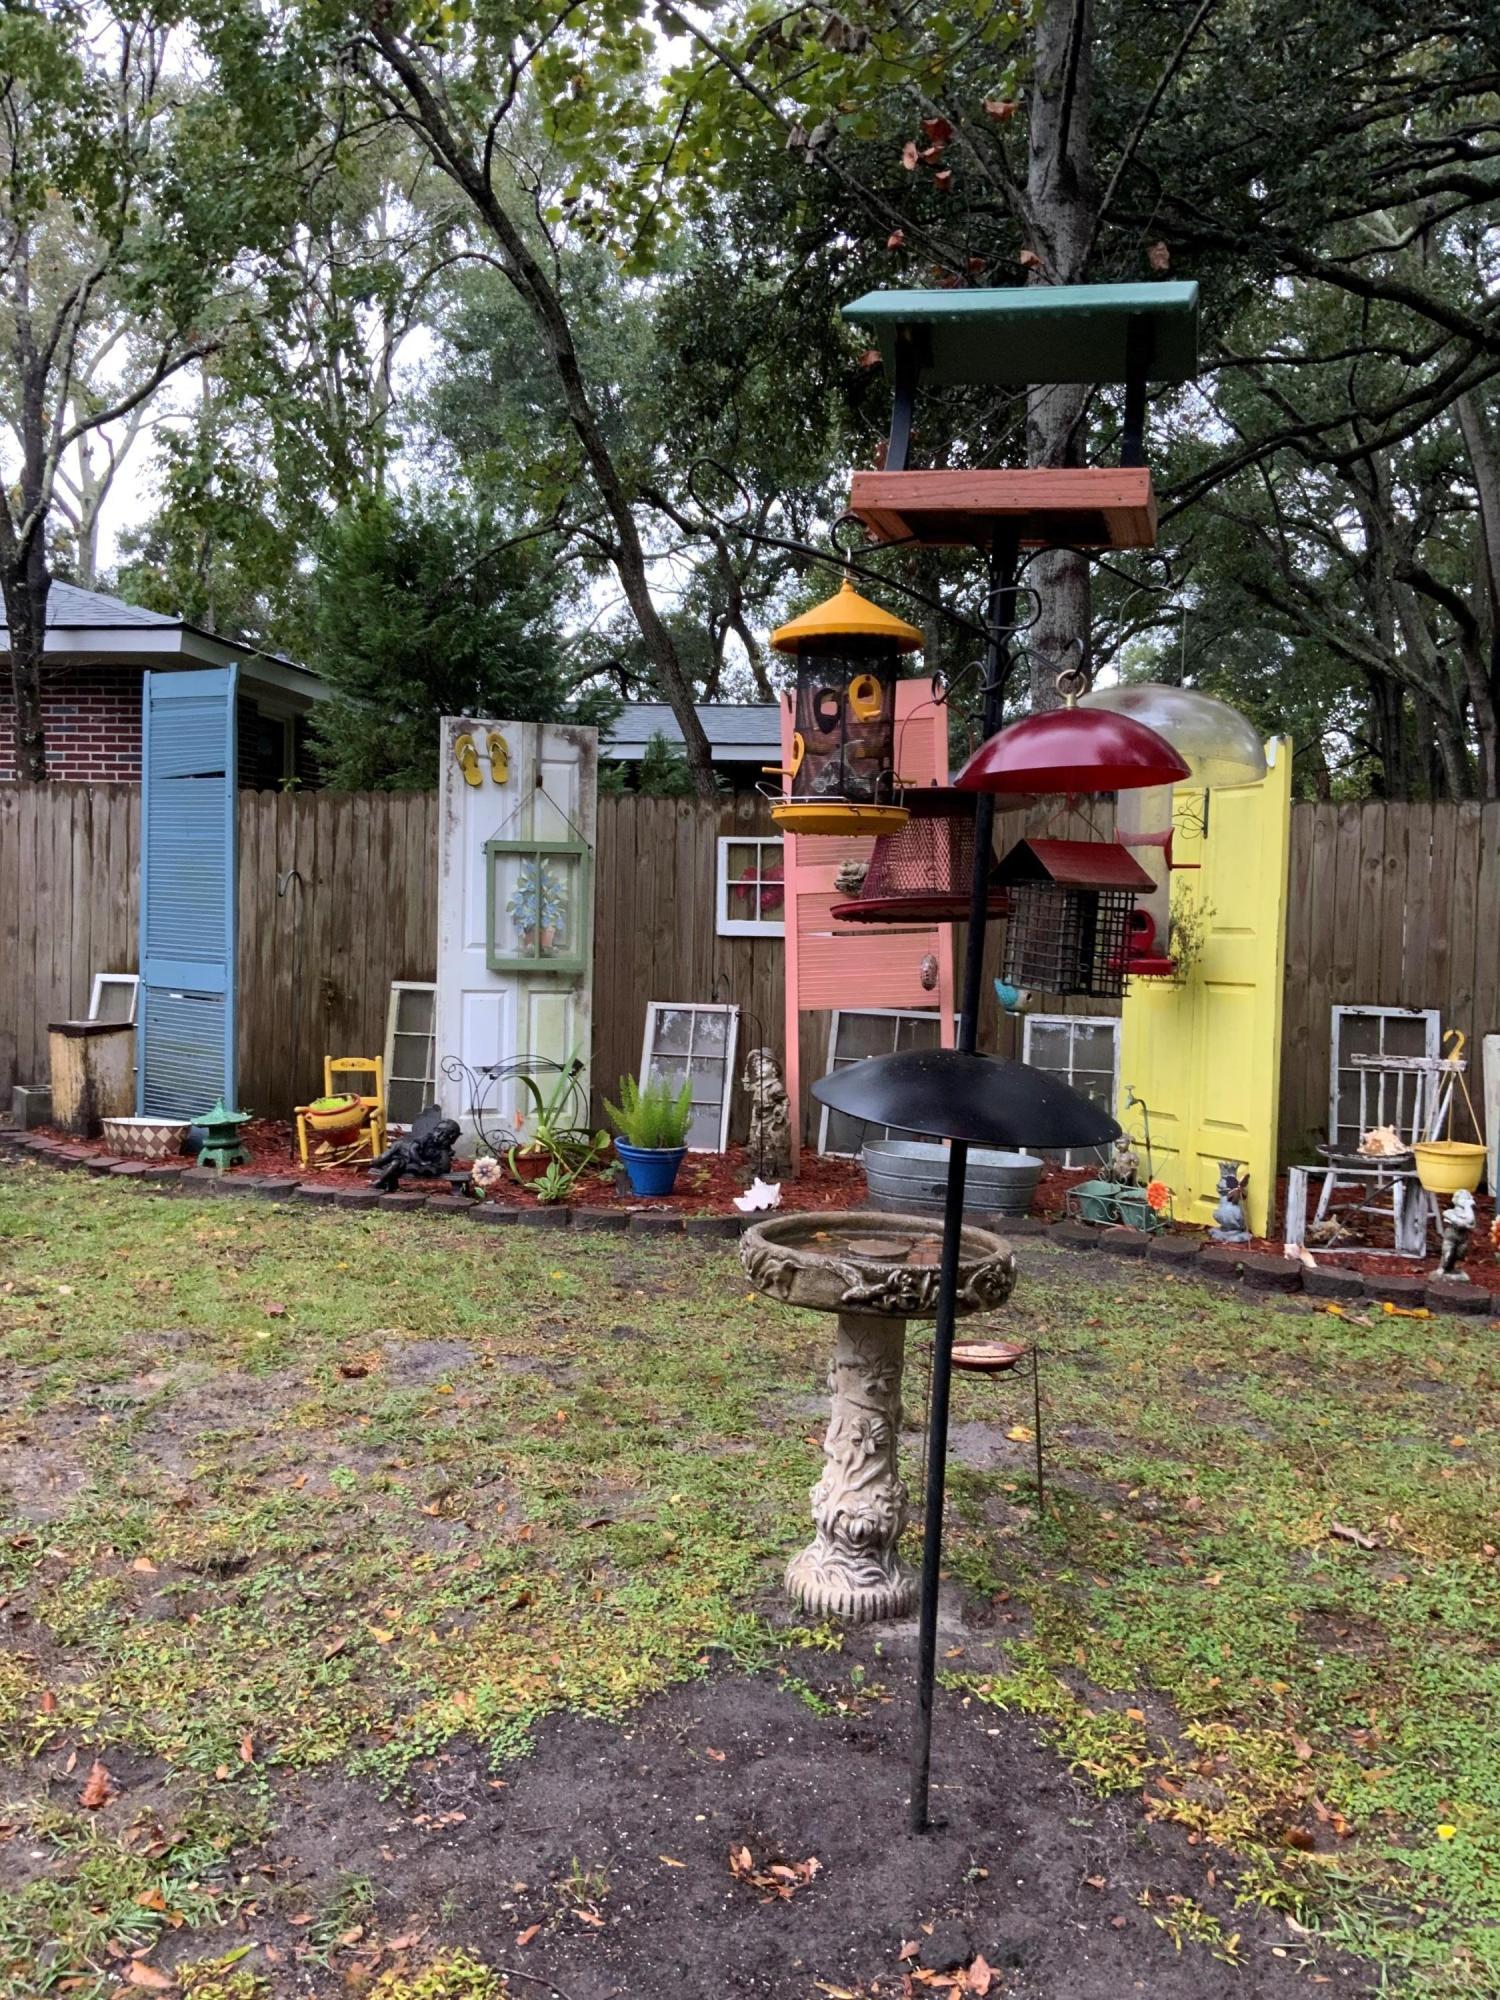 Northbridge Terrace Homes For Sale - 1156 Northbridge, Charleston, SC - 3